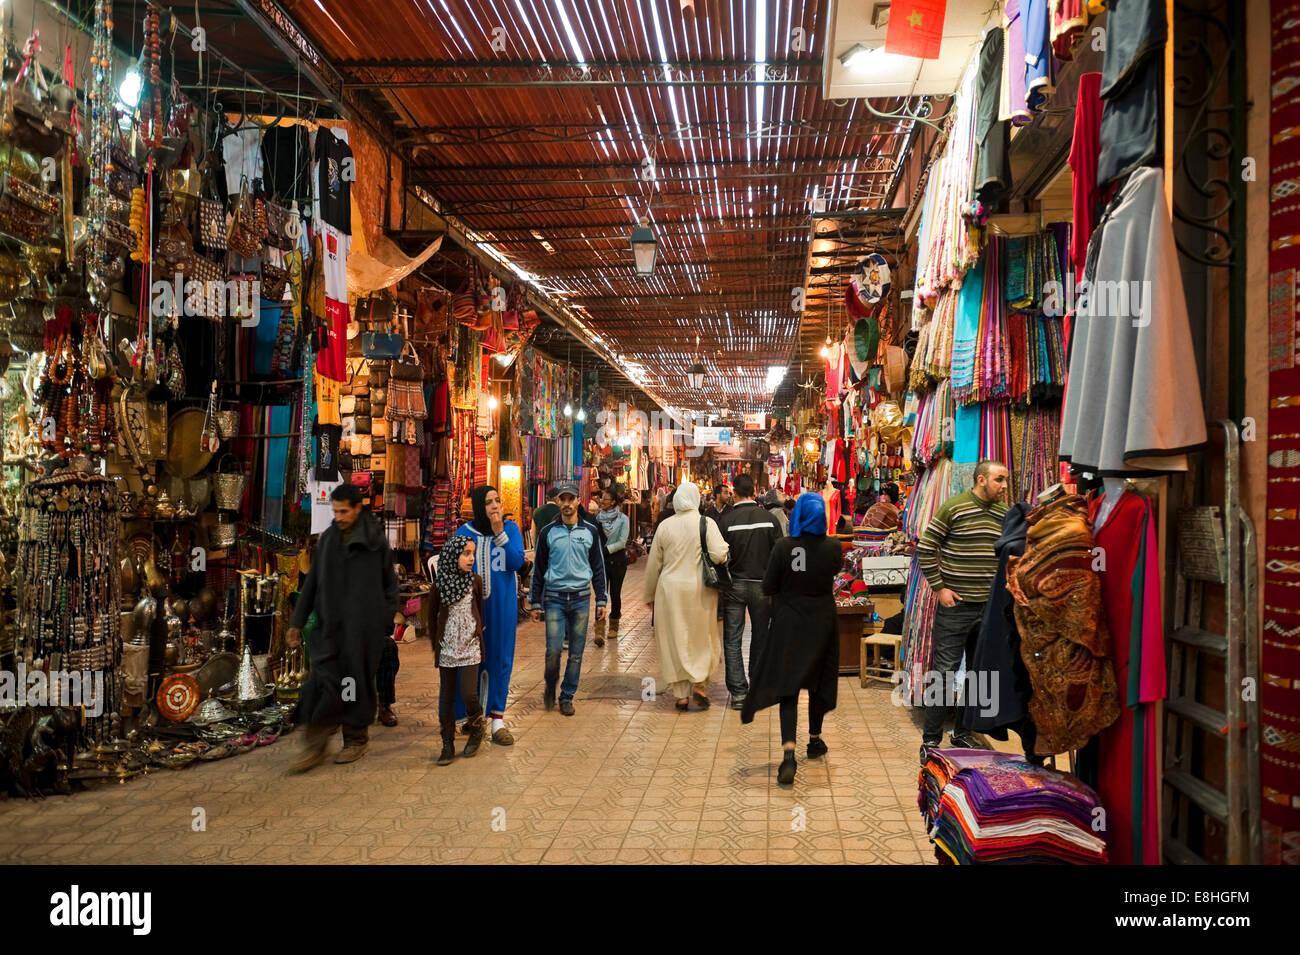 Horizontal view of people walking through the souks of Marrakech. Stock Photo